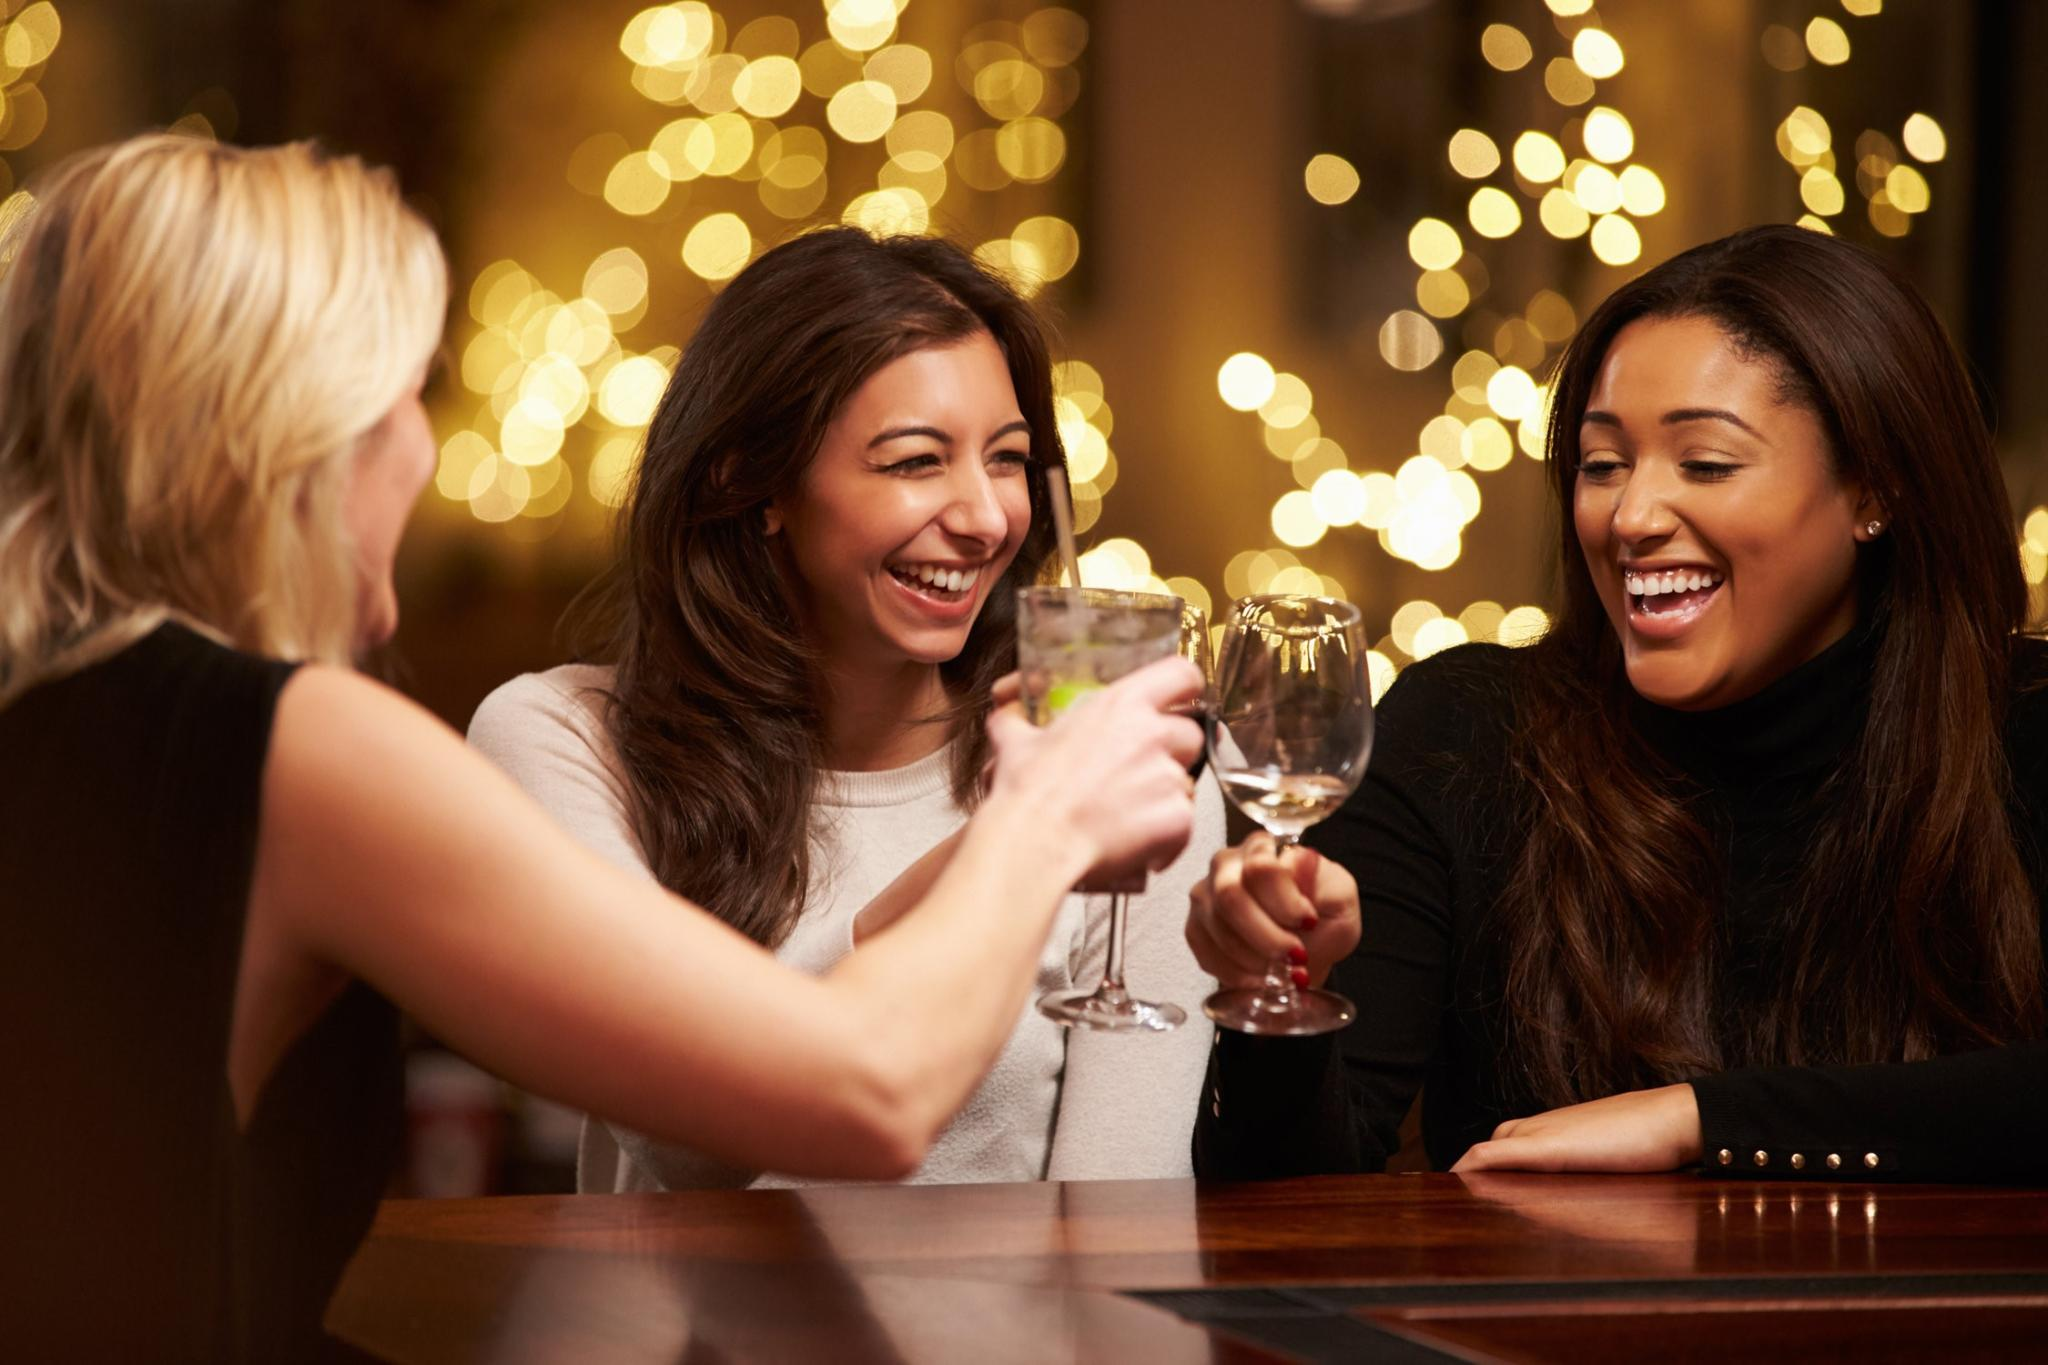 Women Toasting Wine Glasses